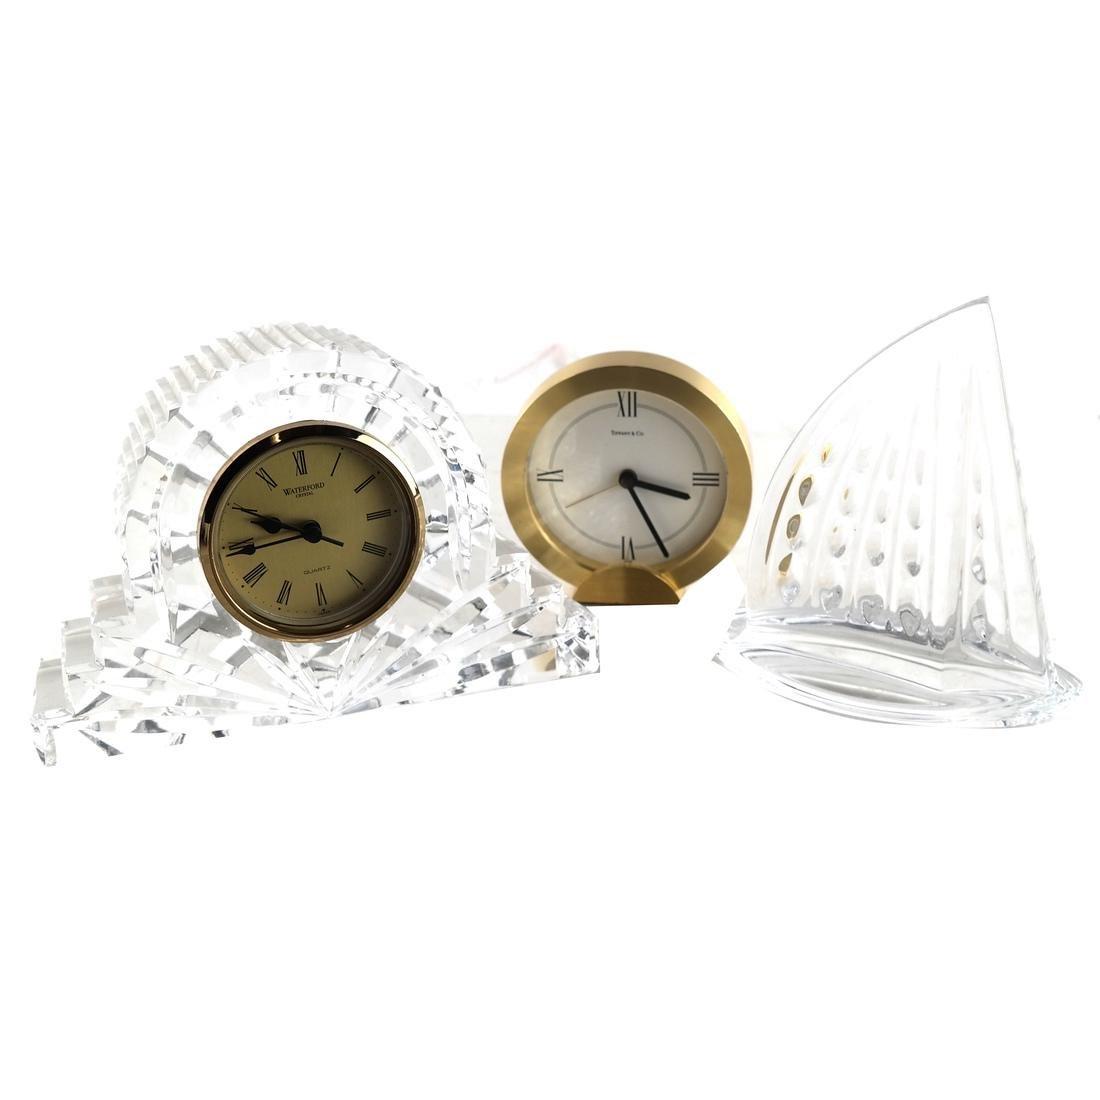 Sailboat Sculpture, 2 Clocks (One Glass)